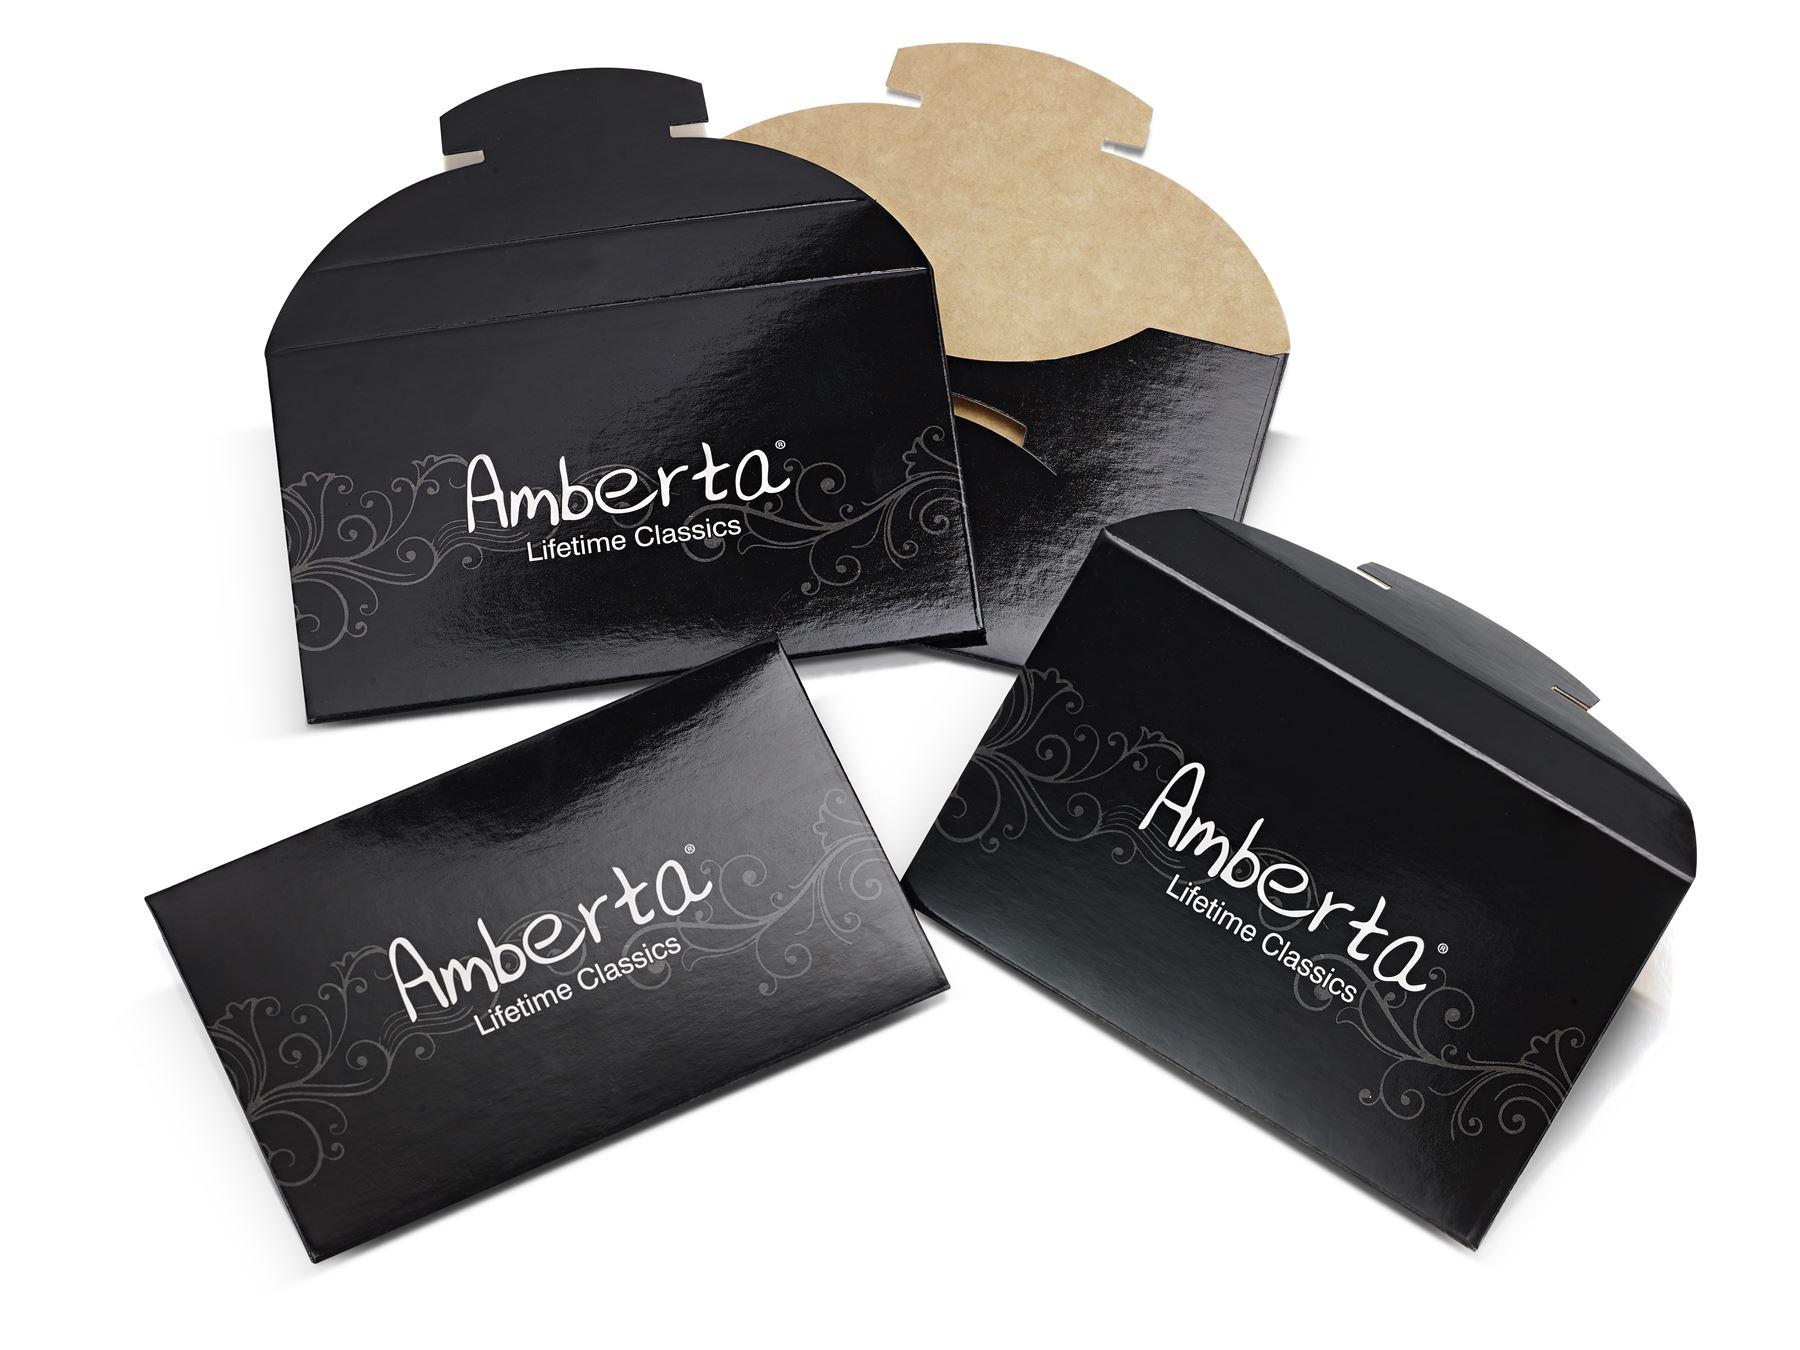 Amberta-Jewelry-925-Sterling-Silver-Adjustable-Bracelet-Italian-Bangle-for-Women miniature 22